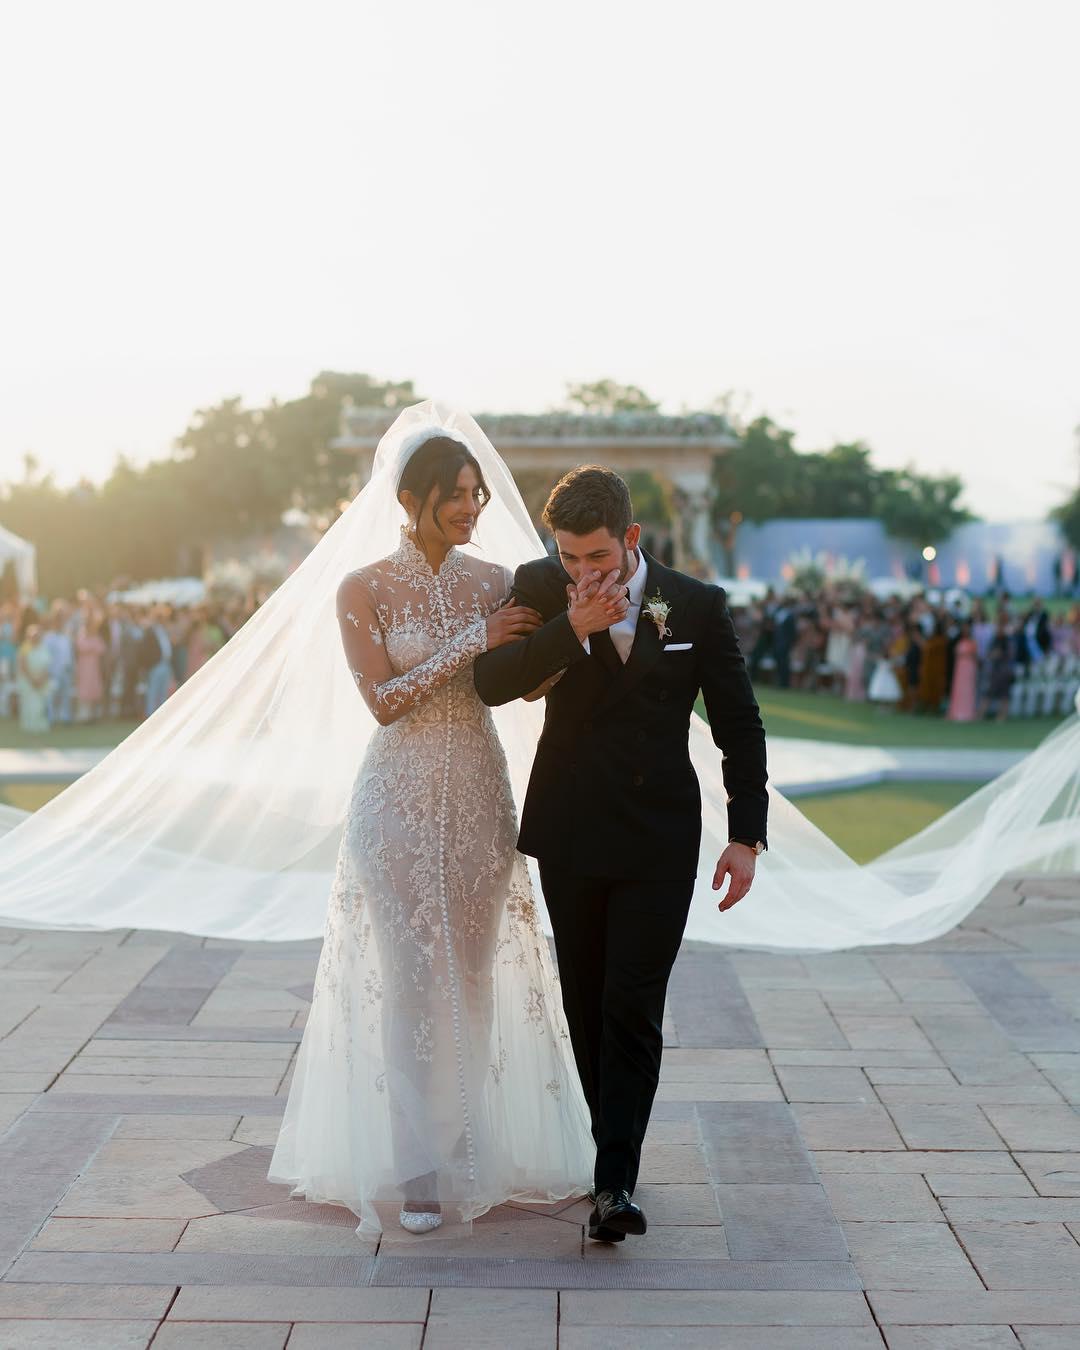 Priyanka Chopra And Nick Jonas Revealed their Honeymoon Destination And It Sounds So Magical